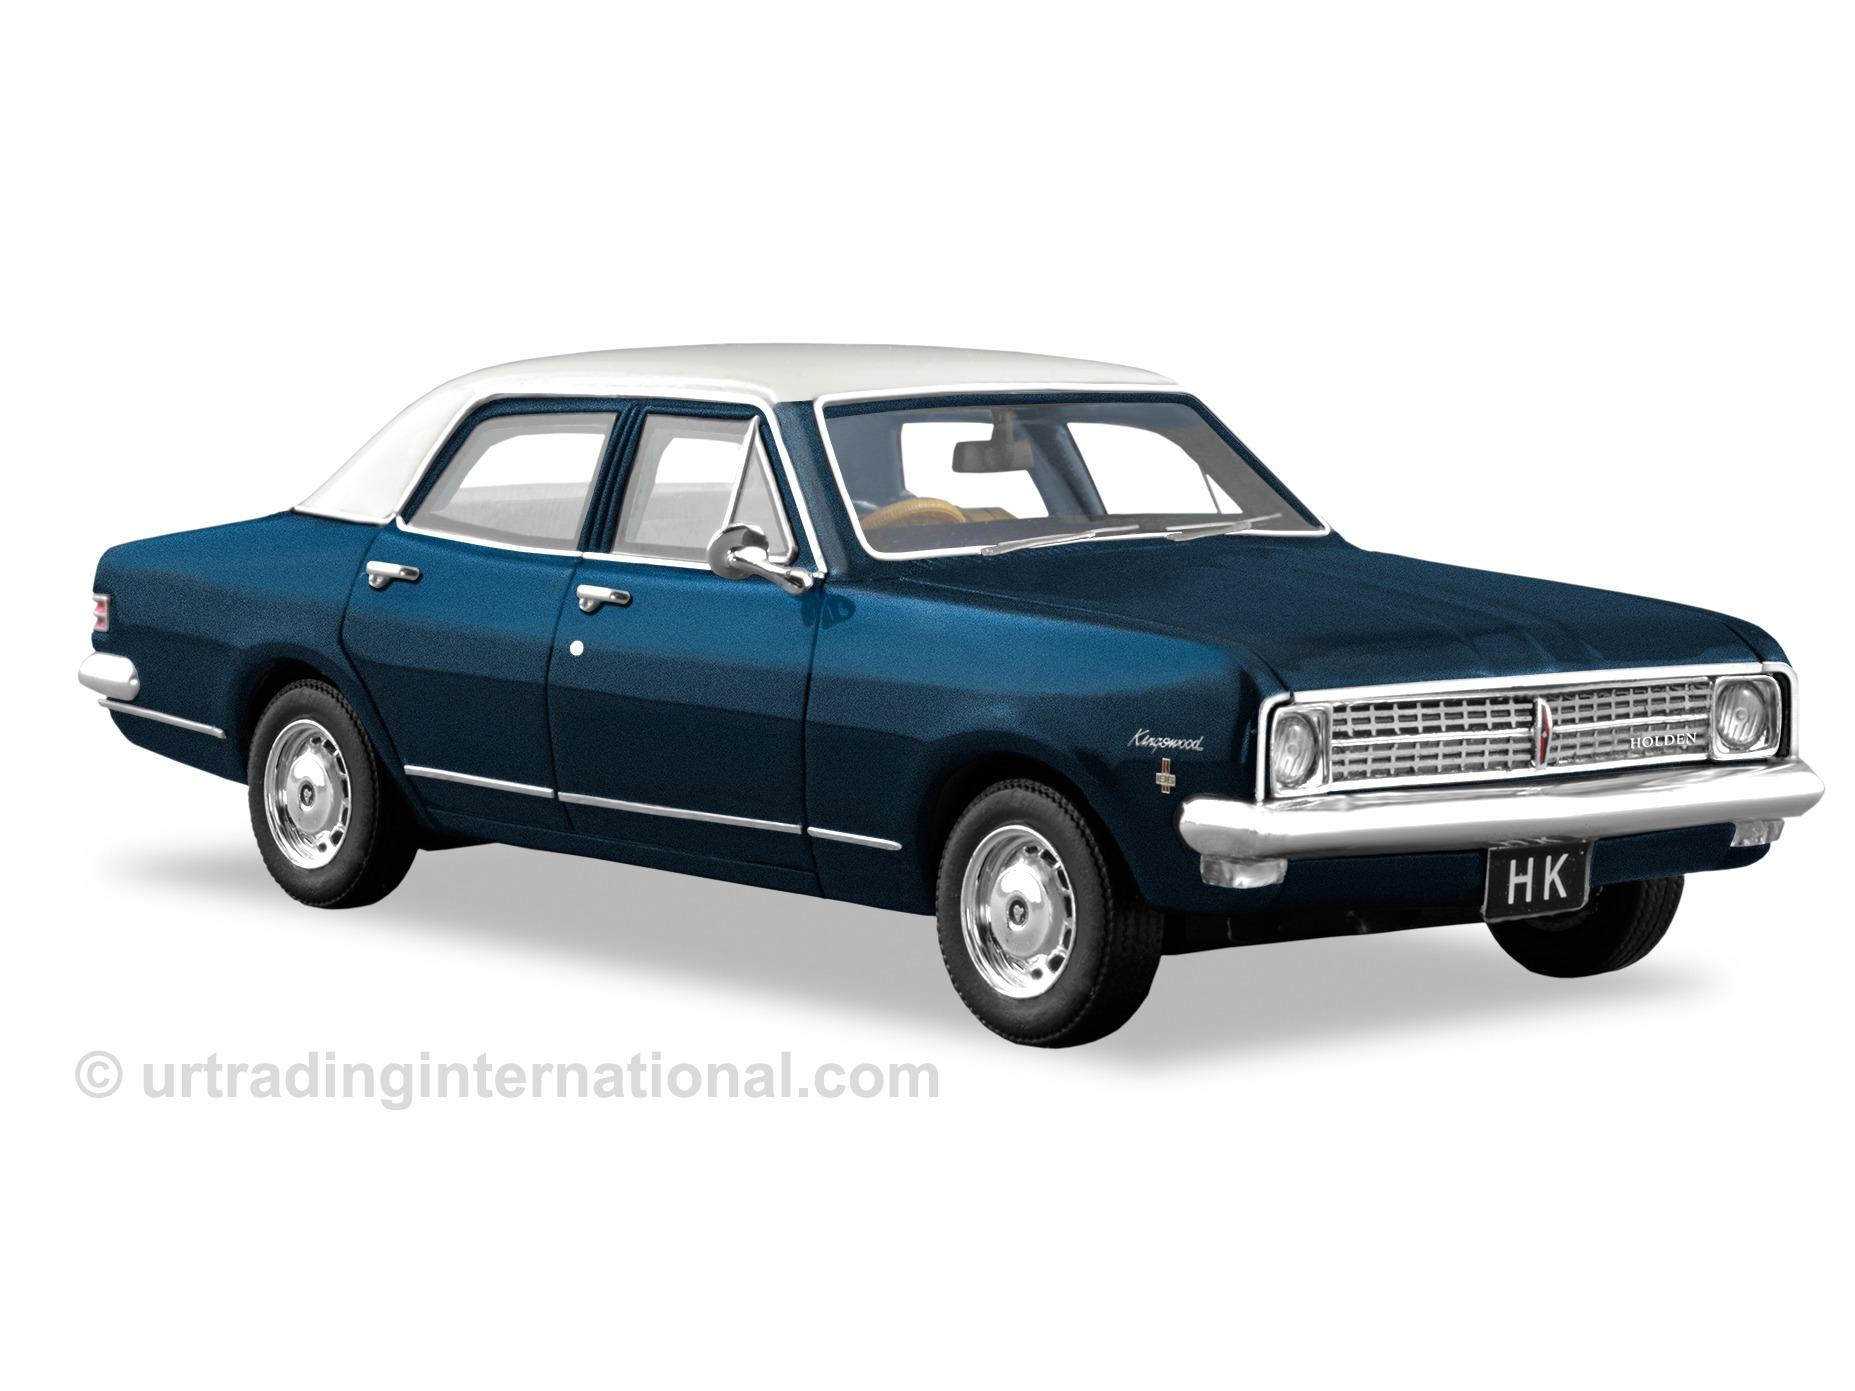 HK Kingswood Sedan – Paragon Blue